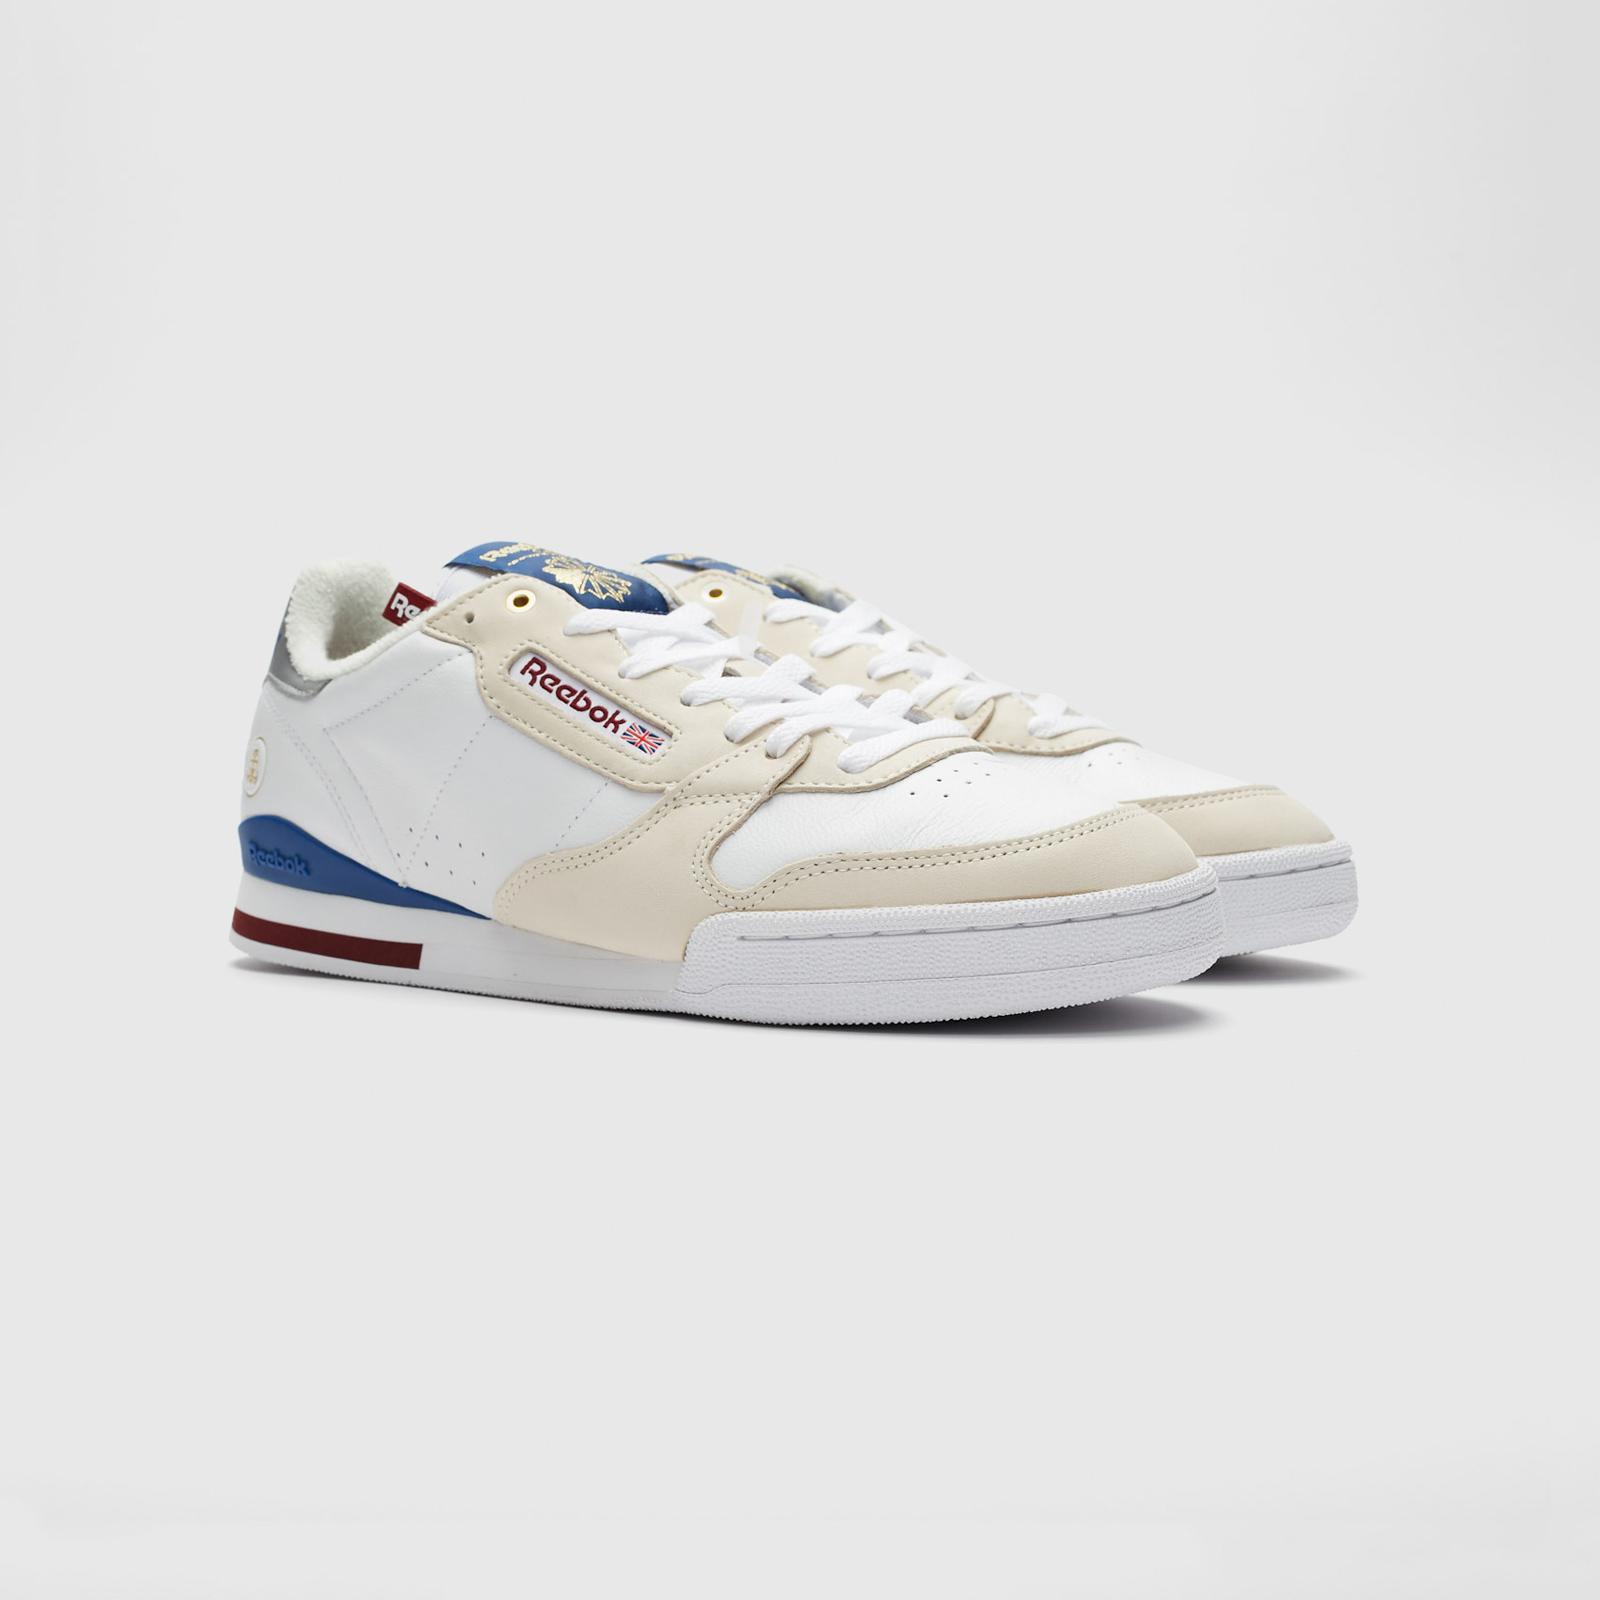 5462209441174 Reebok Phase 1 MU x Foot Patrol x HAL - Cn6136 - Sneakersnstuff ...